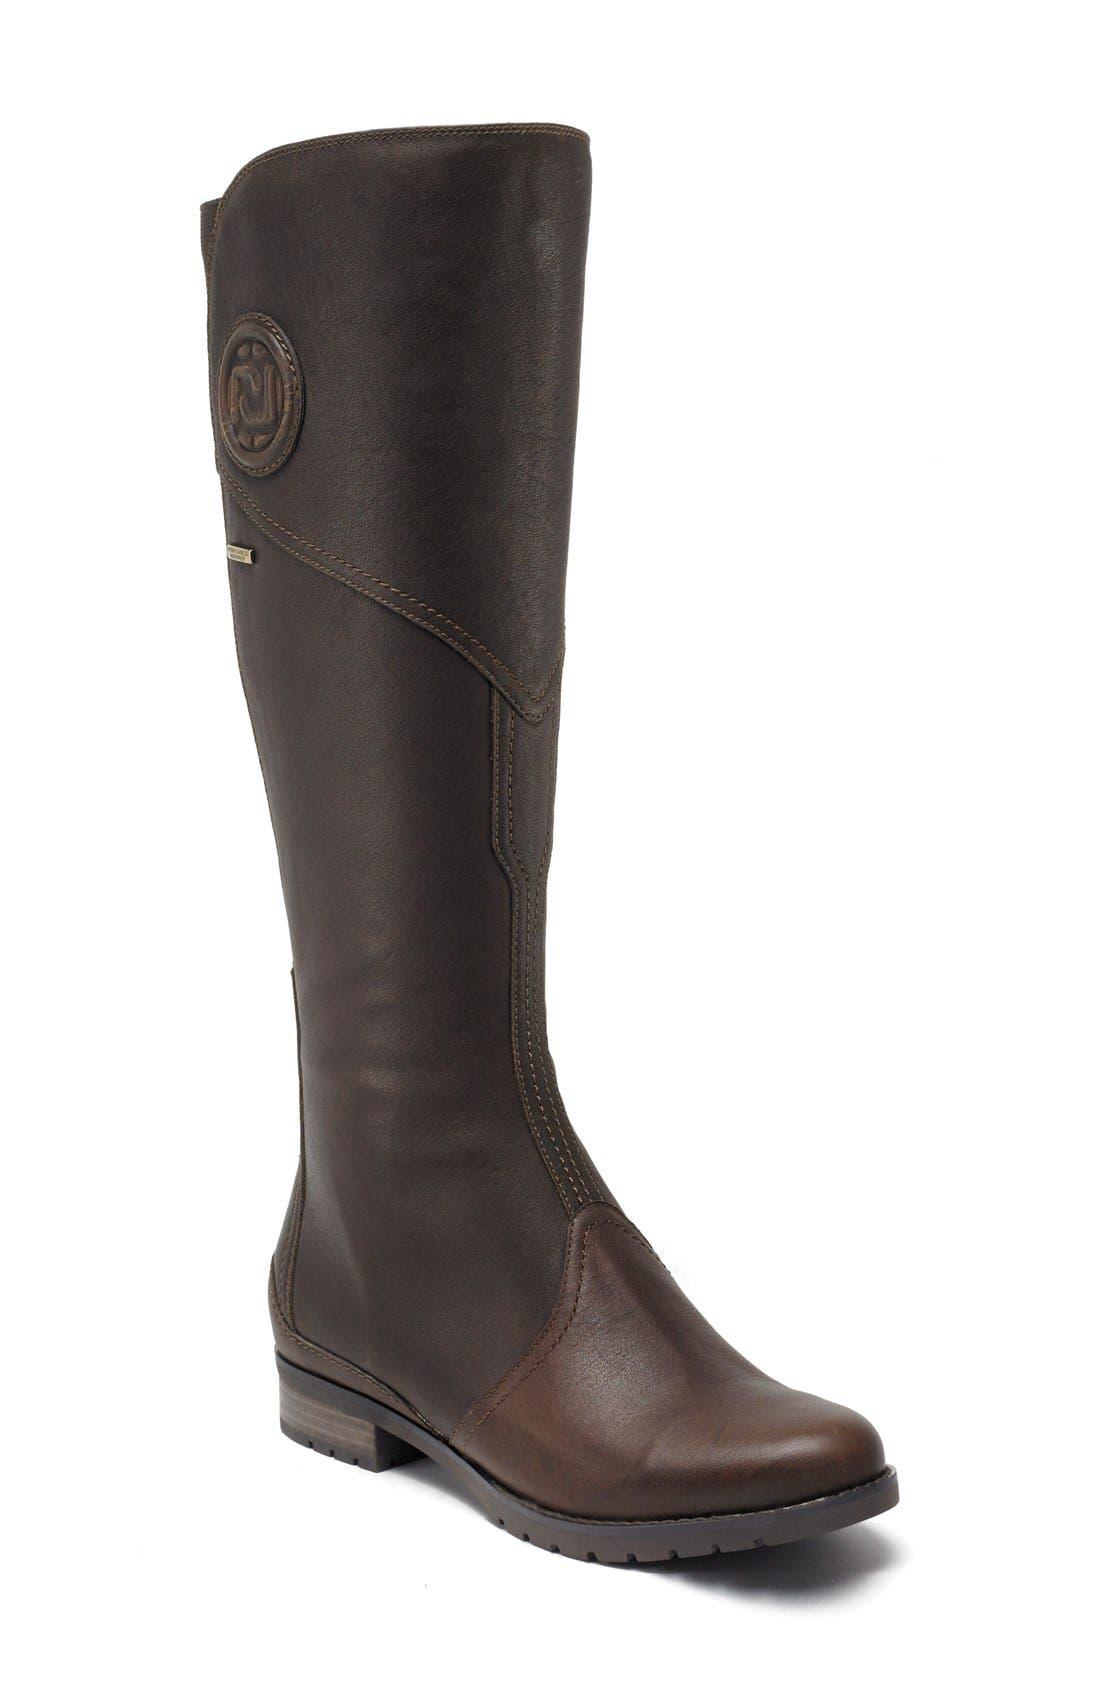 Alternate Image 1 Selected - Rockport 'Tristina Gore' Waterproof Riding Boot (Women)